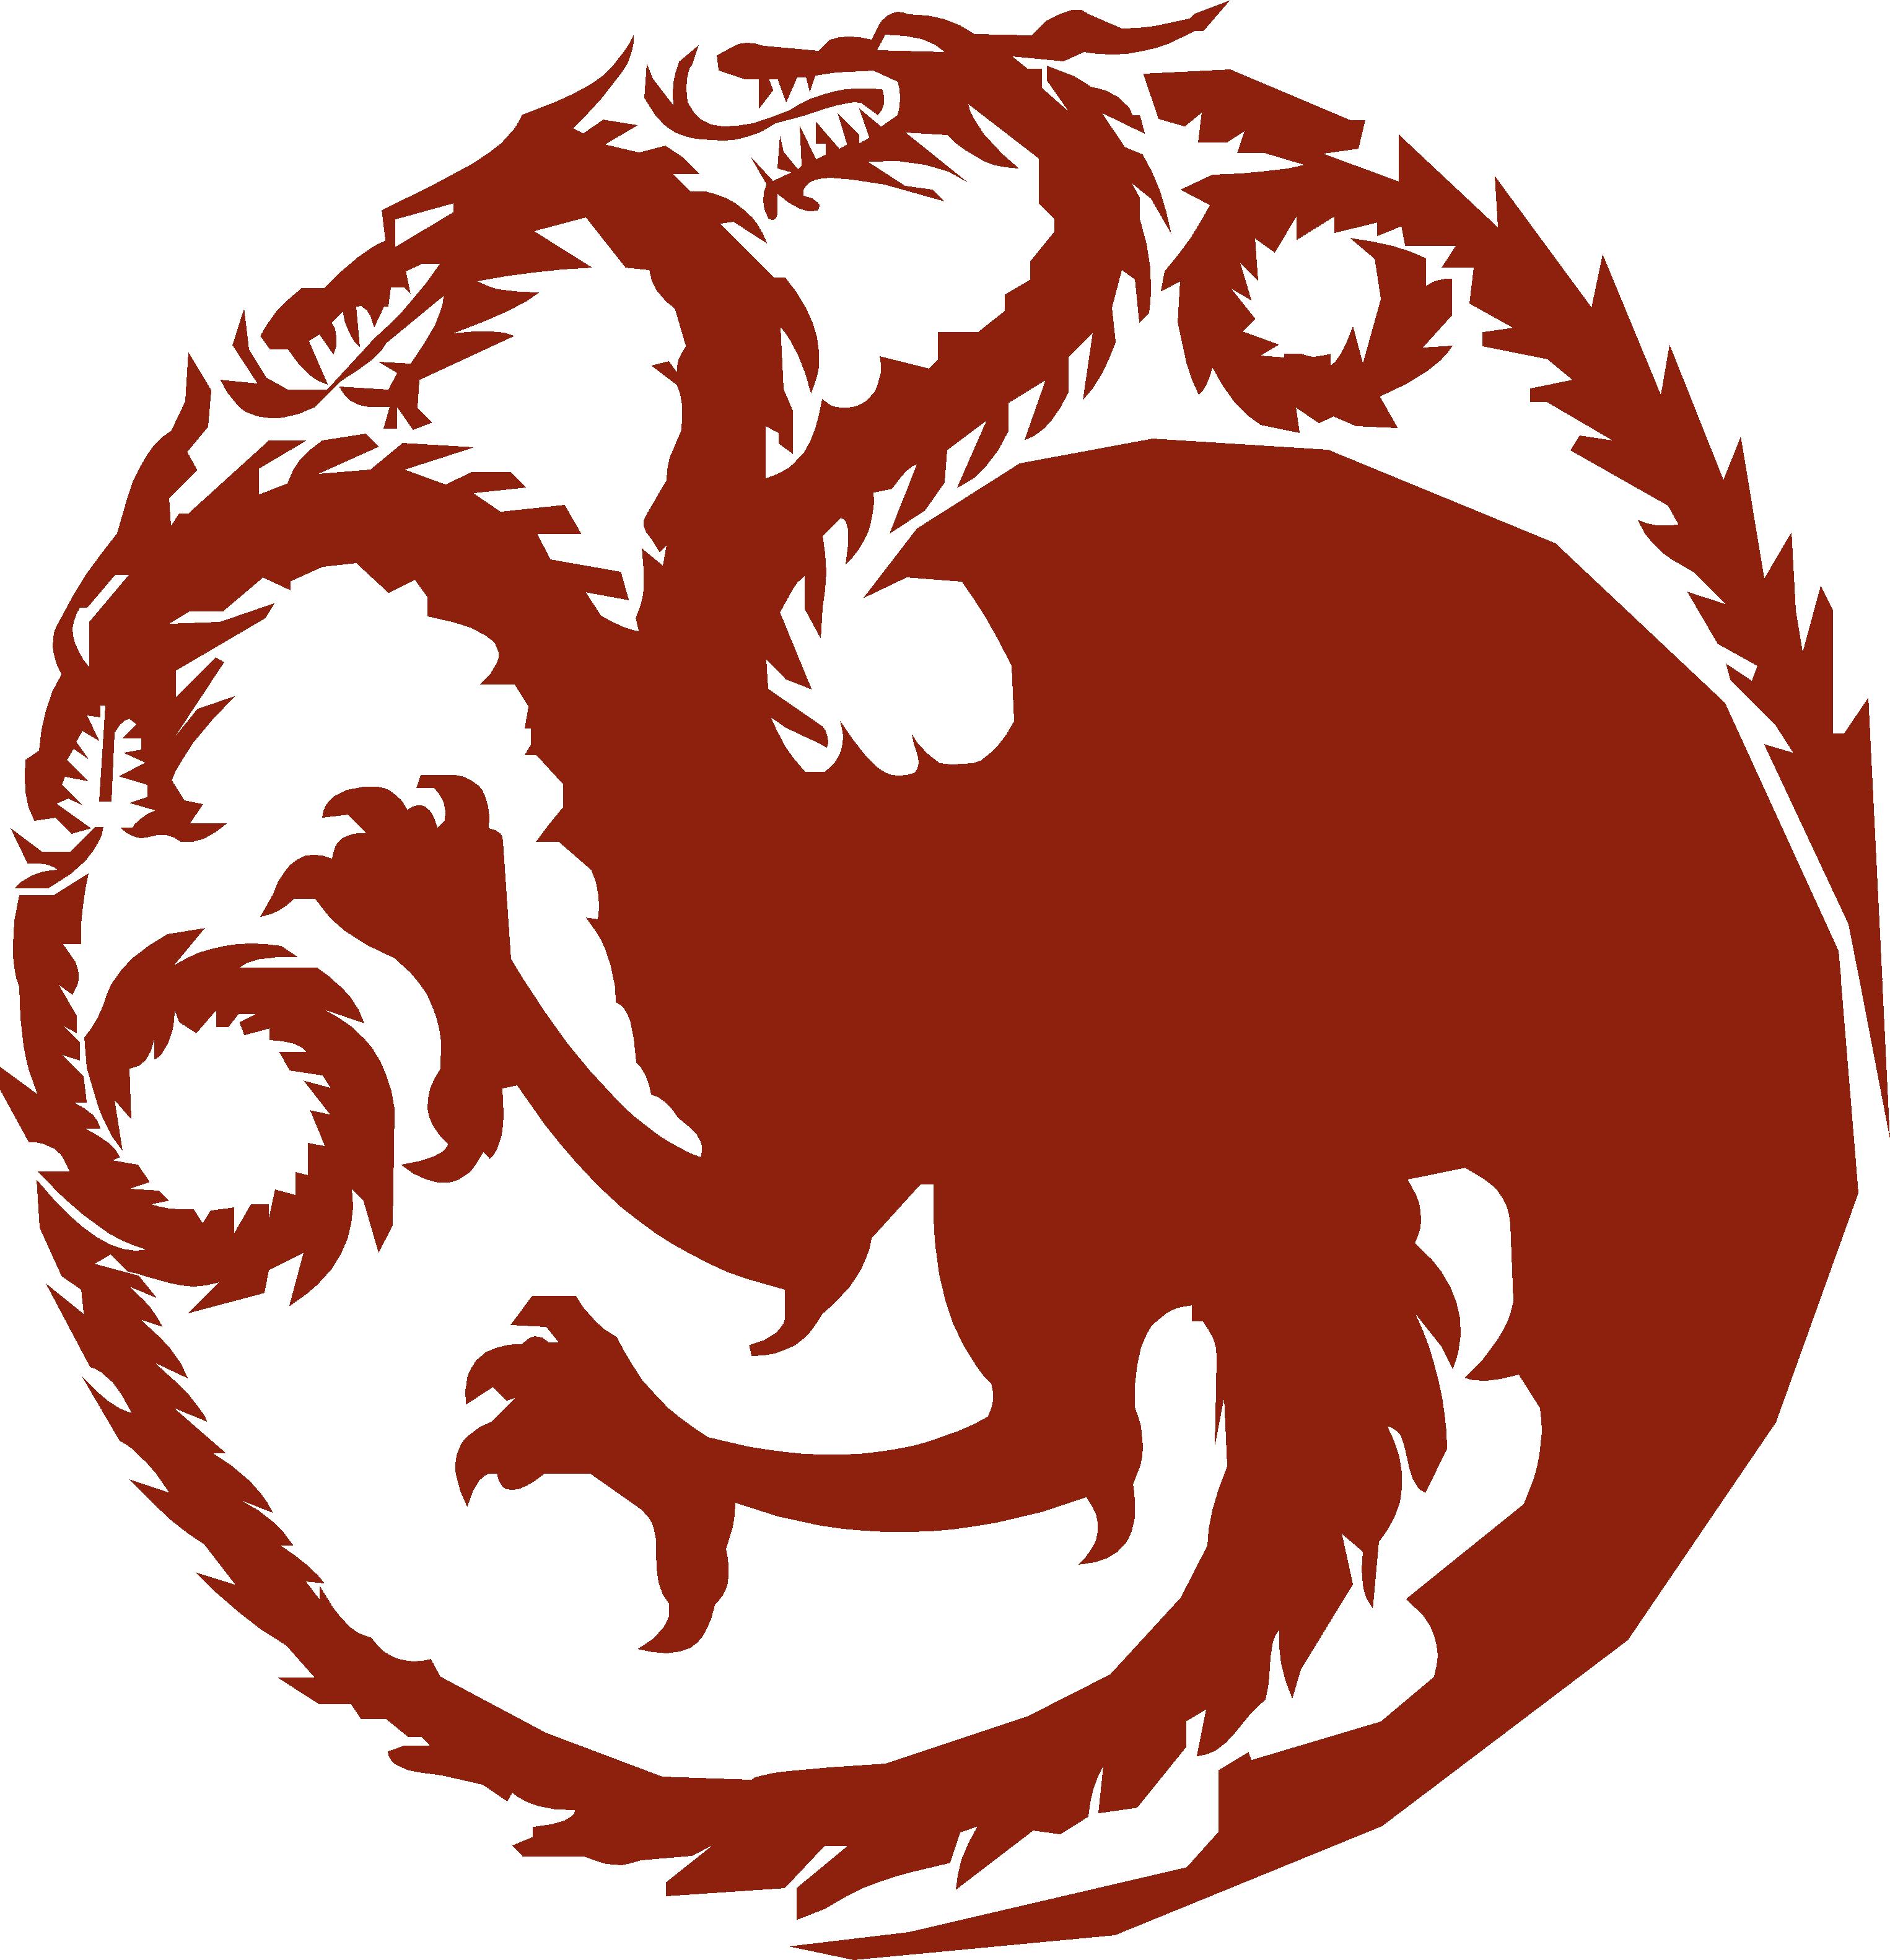 Daenerys targaryen tyrion lannister. Game of thrones house sigils png